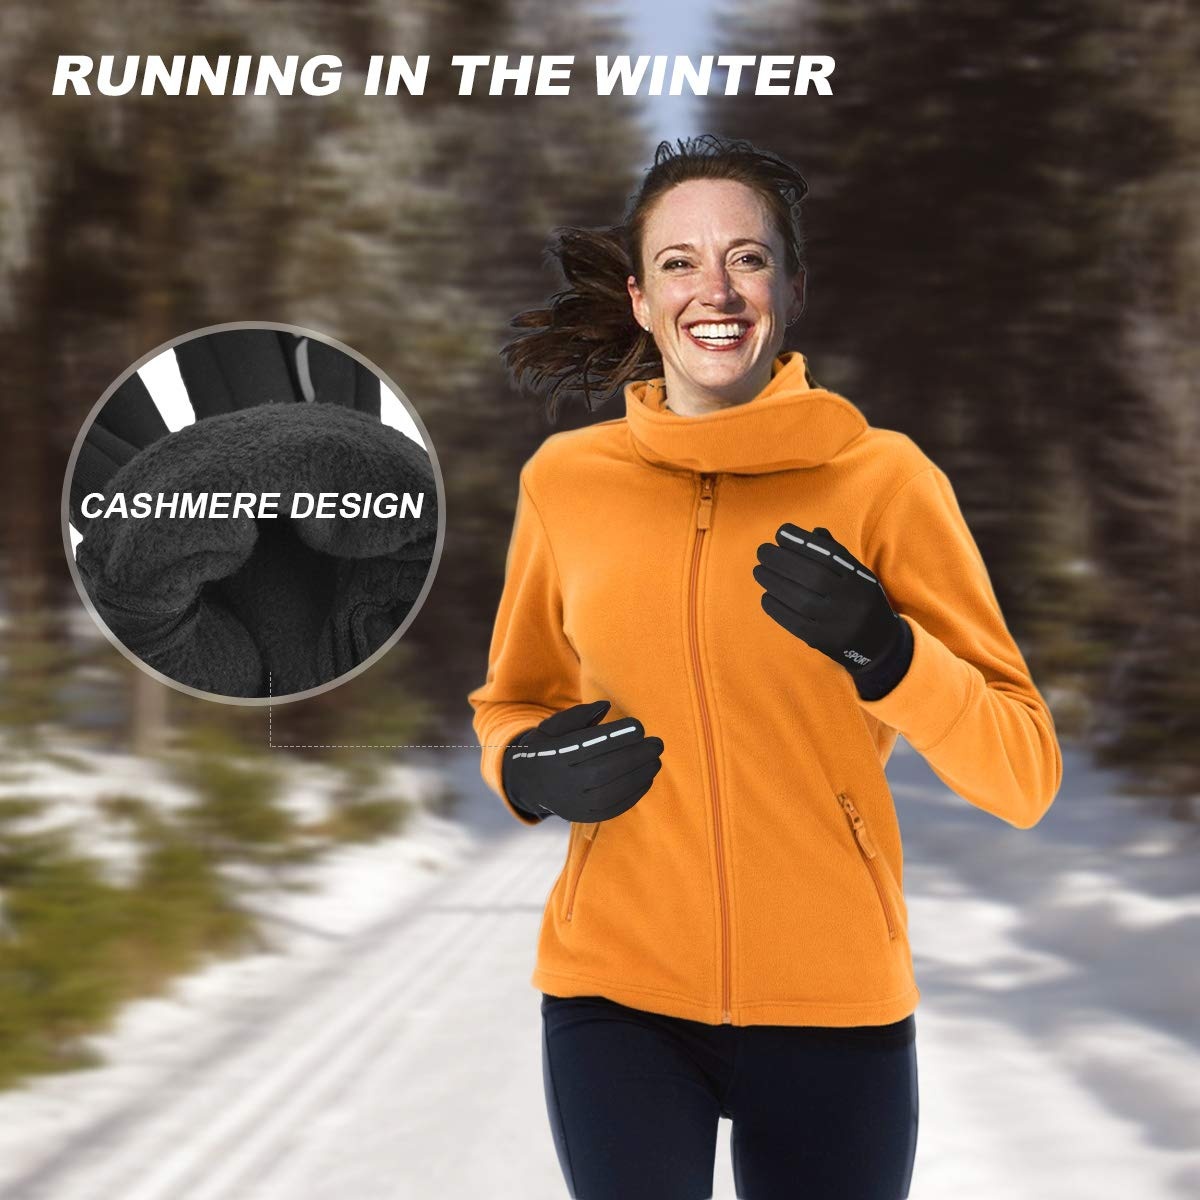 Reflective Design Running Gloves, Full Finger Touchscreen in Winter Outdoor Gel Bike Thin Gloves, Waterproof and Windproof Warm Gloves for Men Women